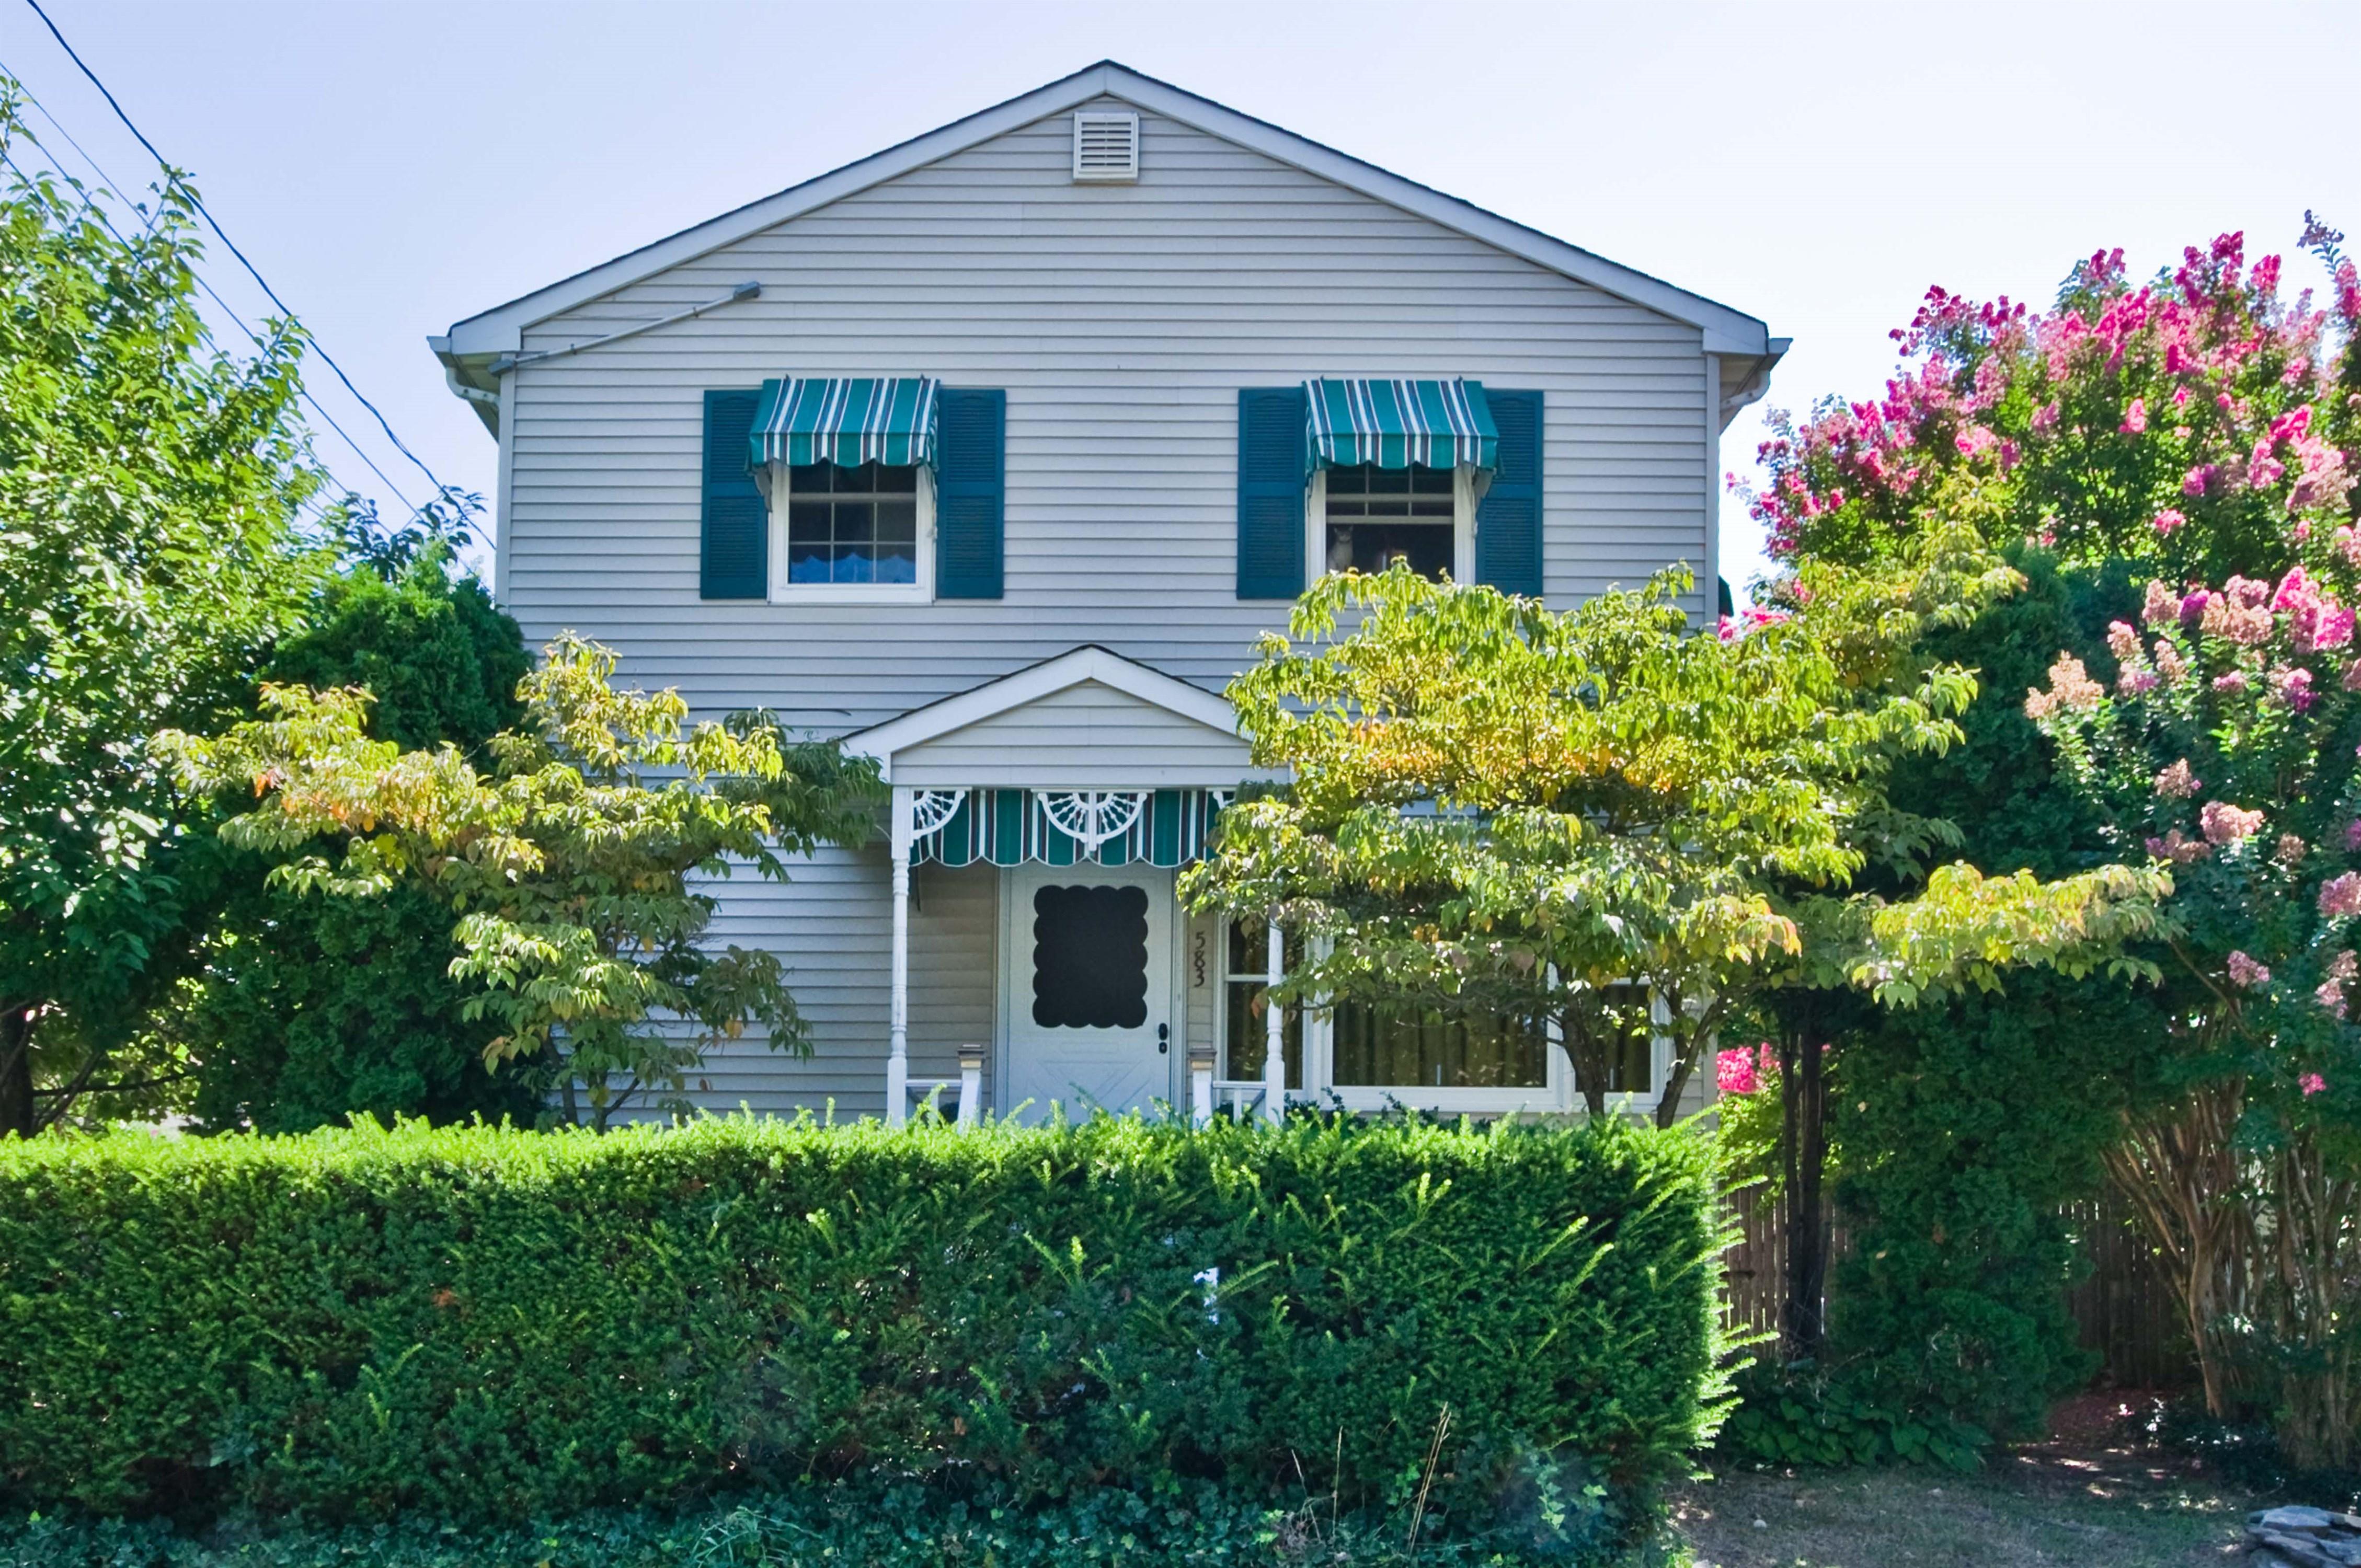 583 Greene Ave., Belford, New Jersey 07718